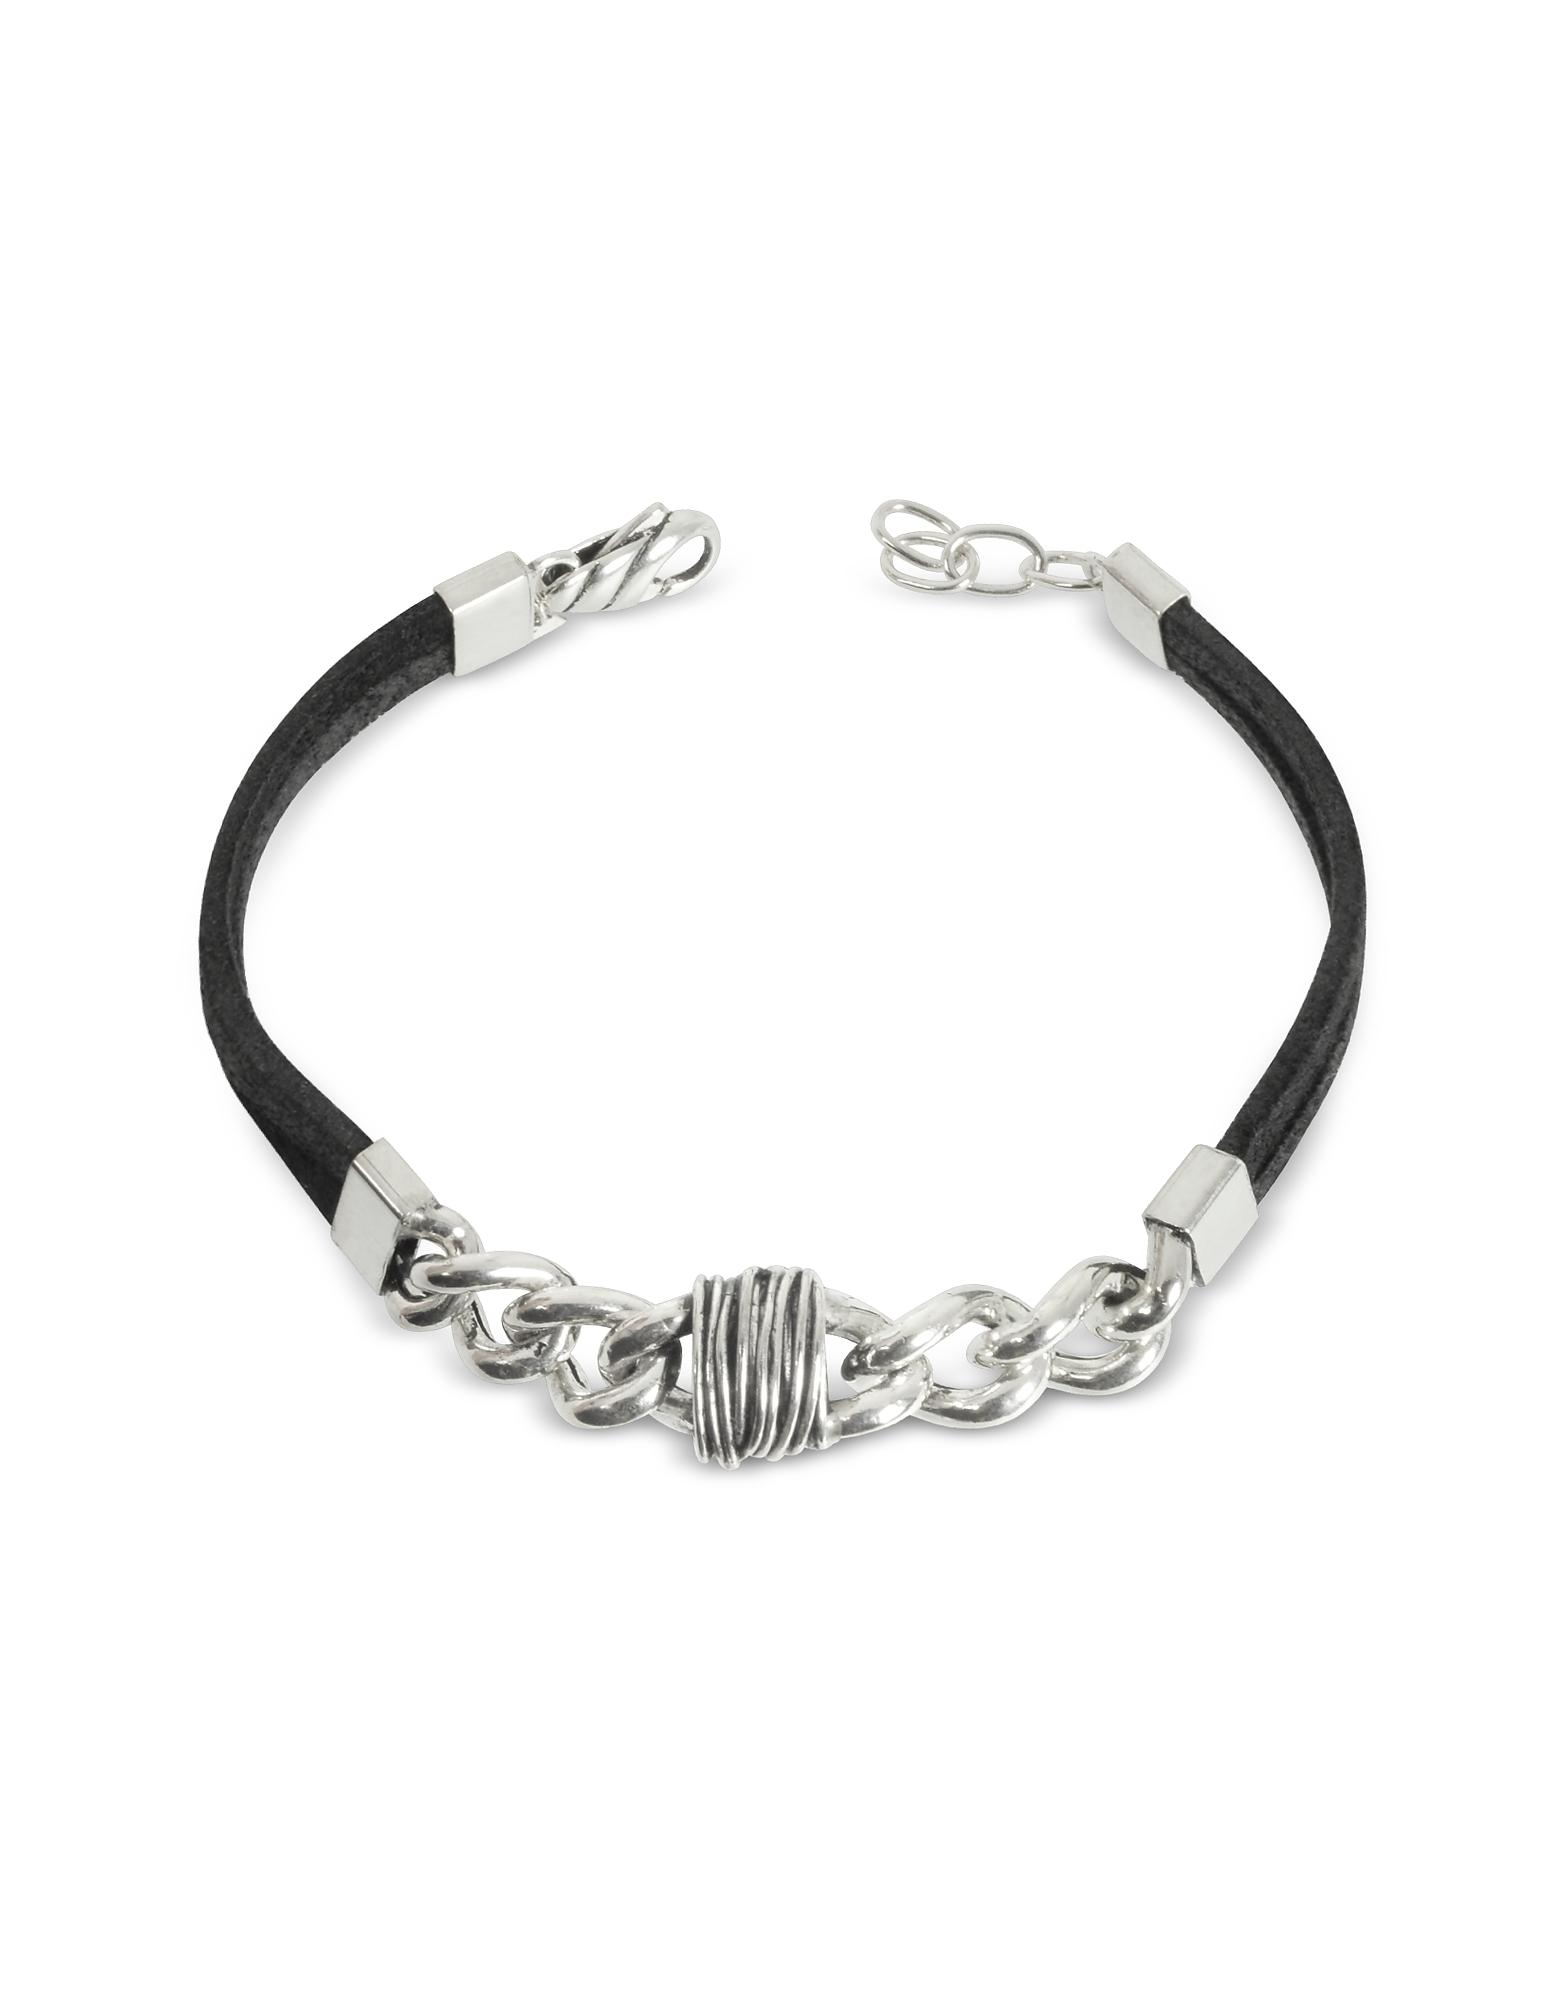 Giacomo Burroni Men's Bracelets, Etruscan Knot Leather Bracelet